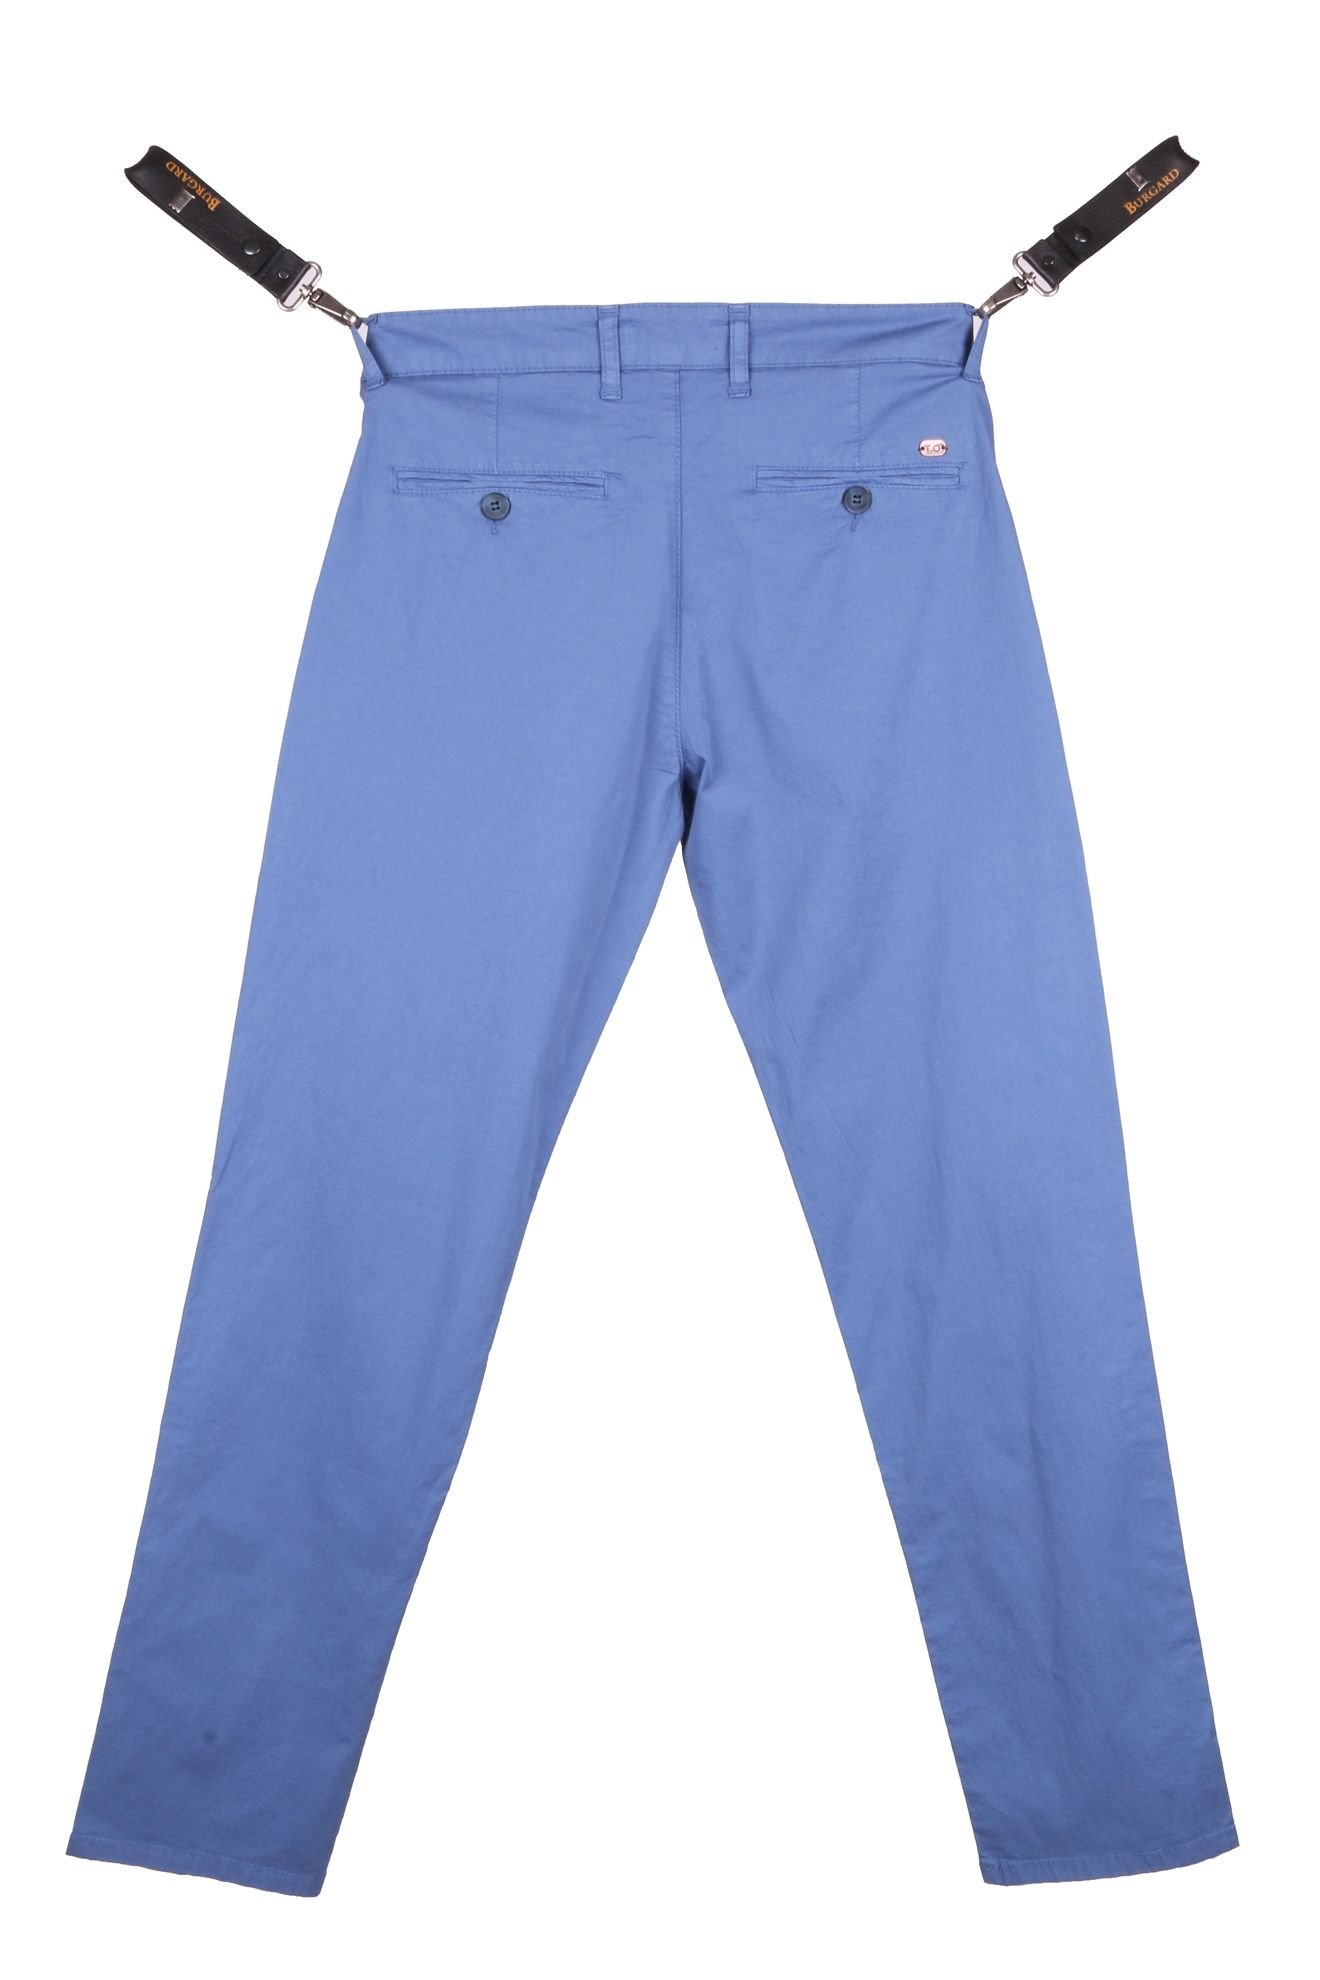 Летние брюки баталы для мужчин  (Арт. JEANS 0085В)